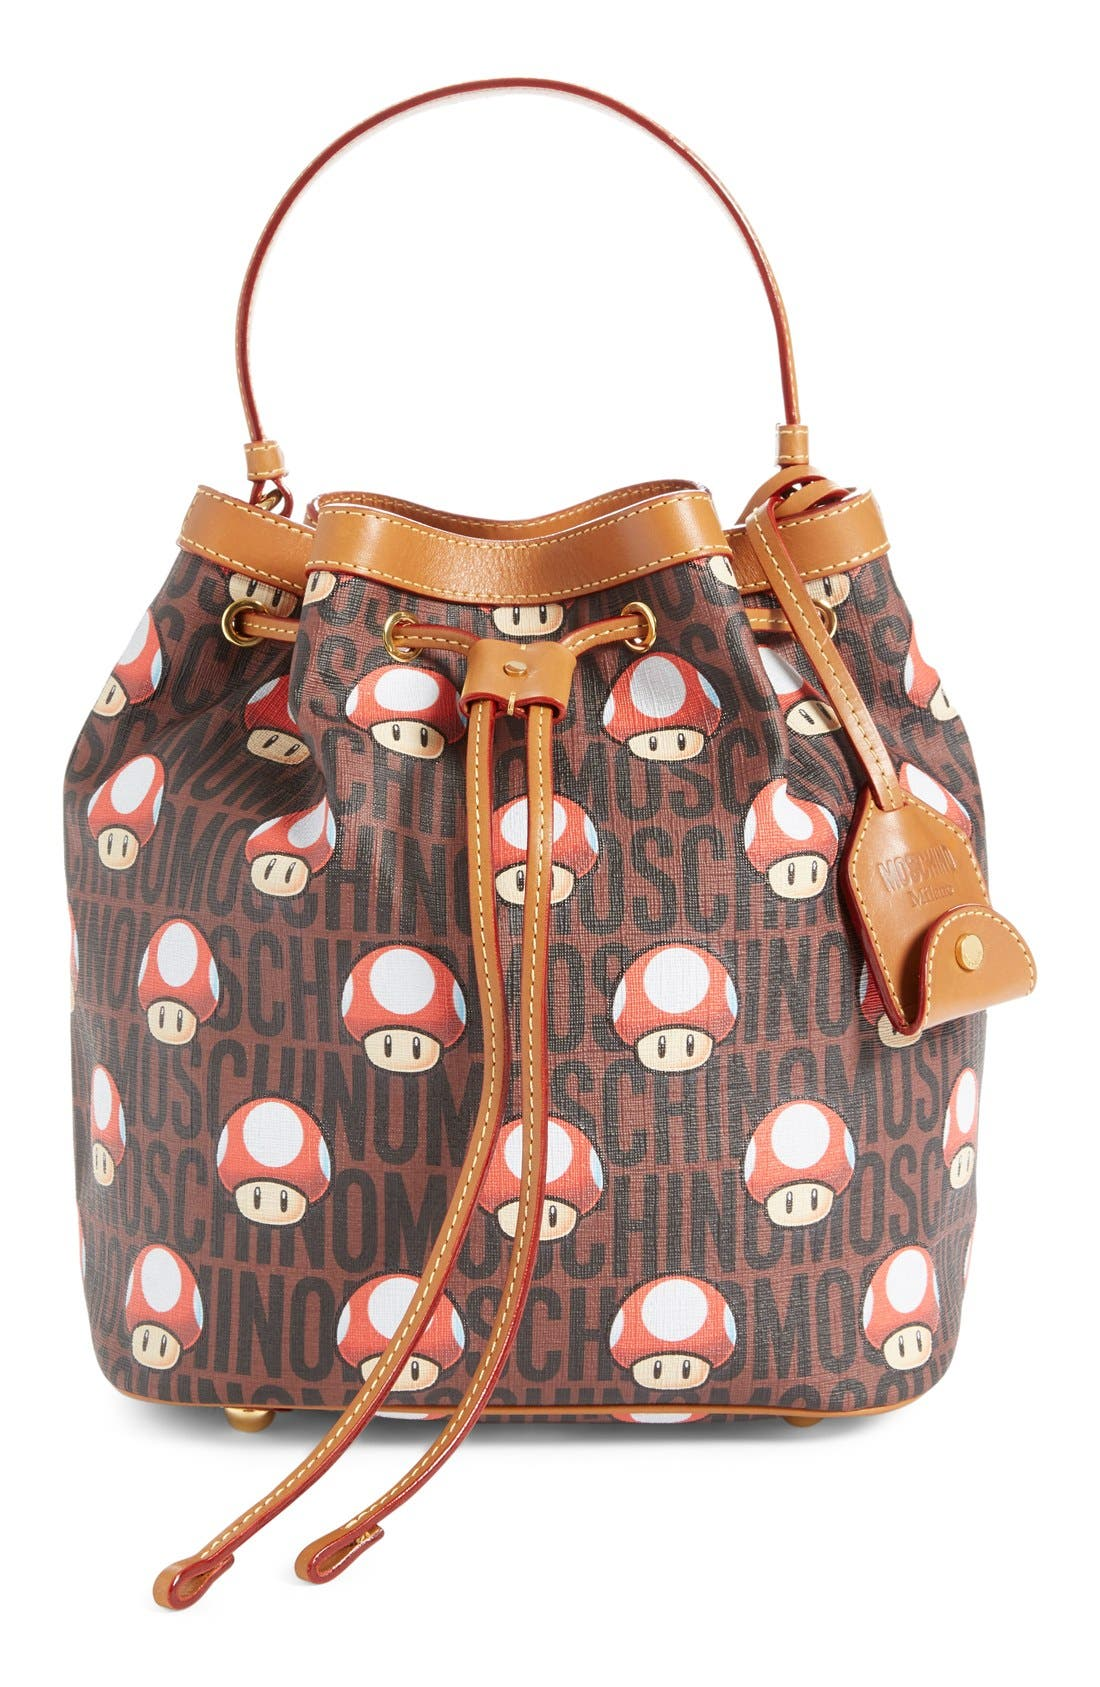 MOSCHINO 'Nintendo Super Mario Bros.<sup>®</sup>' Bucket Bag, Main, color, 200